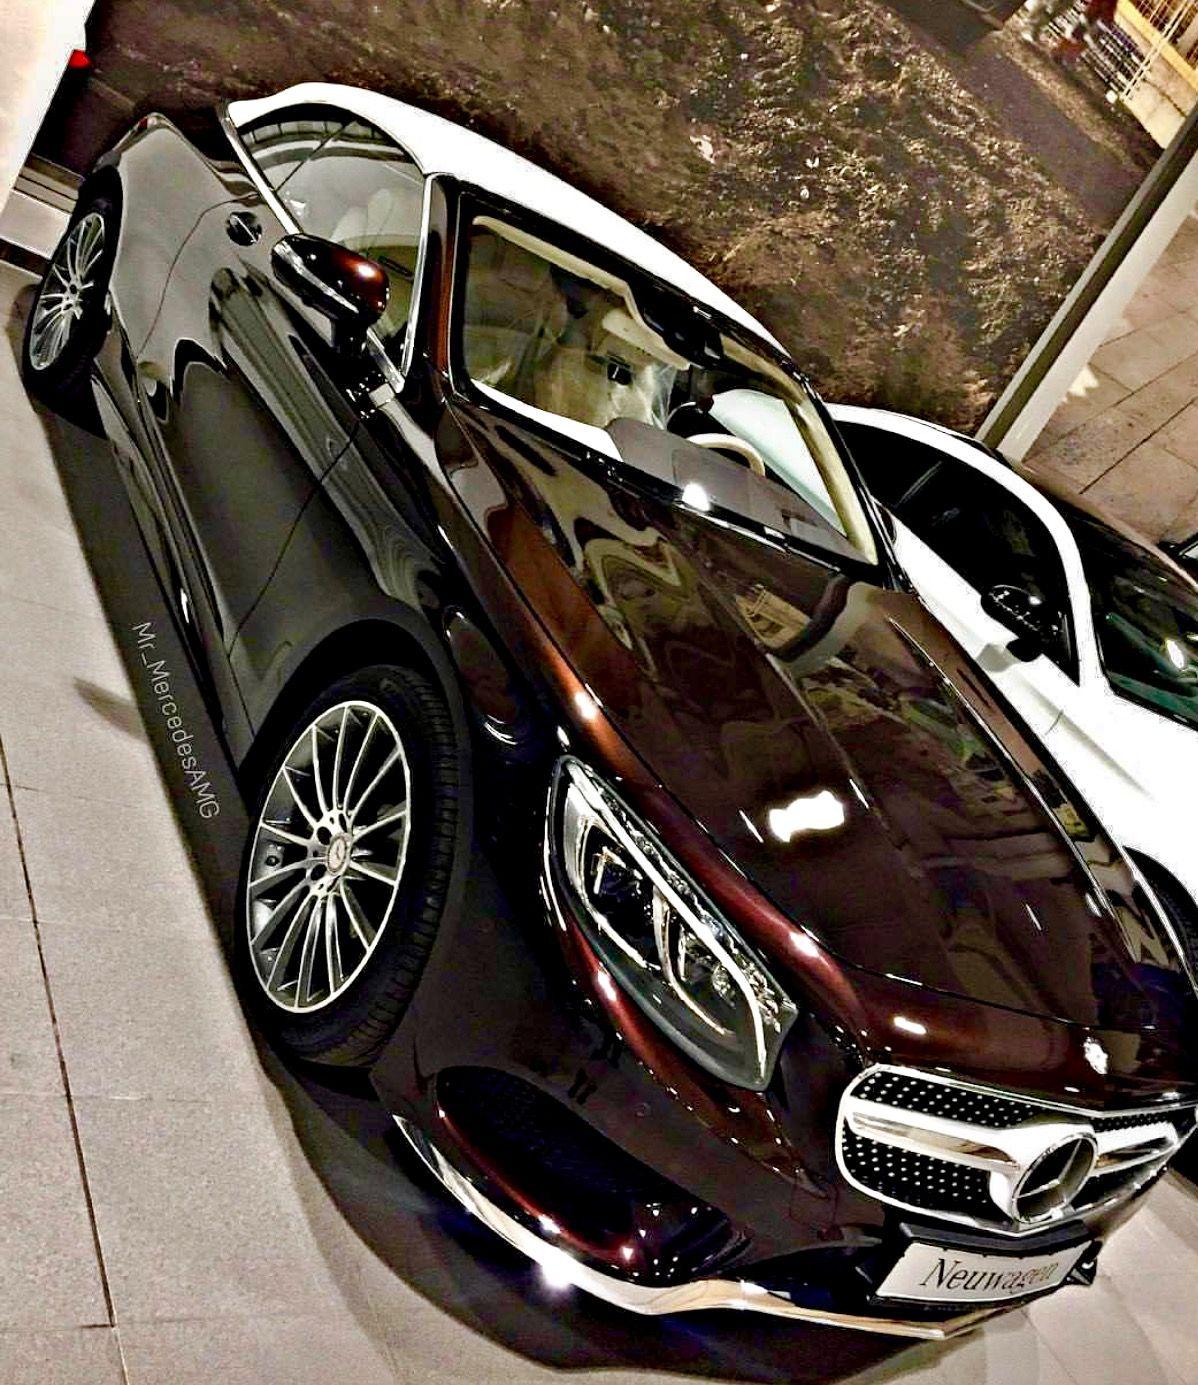 B U C H A N A N Mercedes Truck Mercedes Benz Cars Mercedes Car